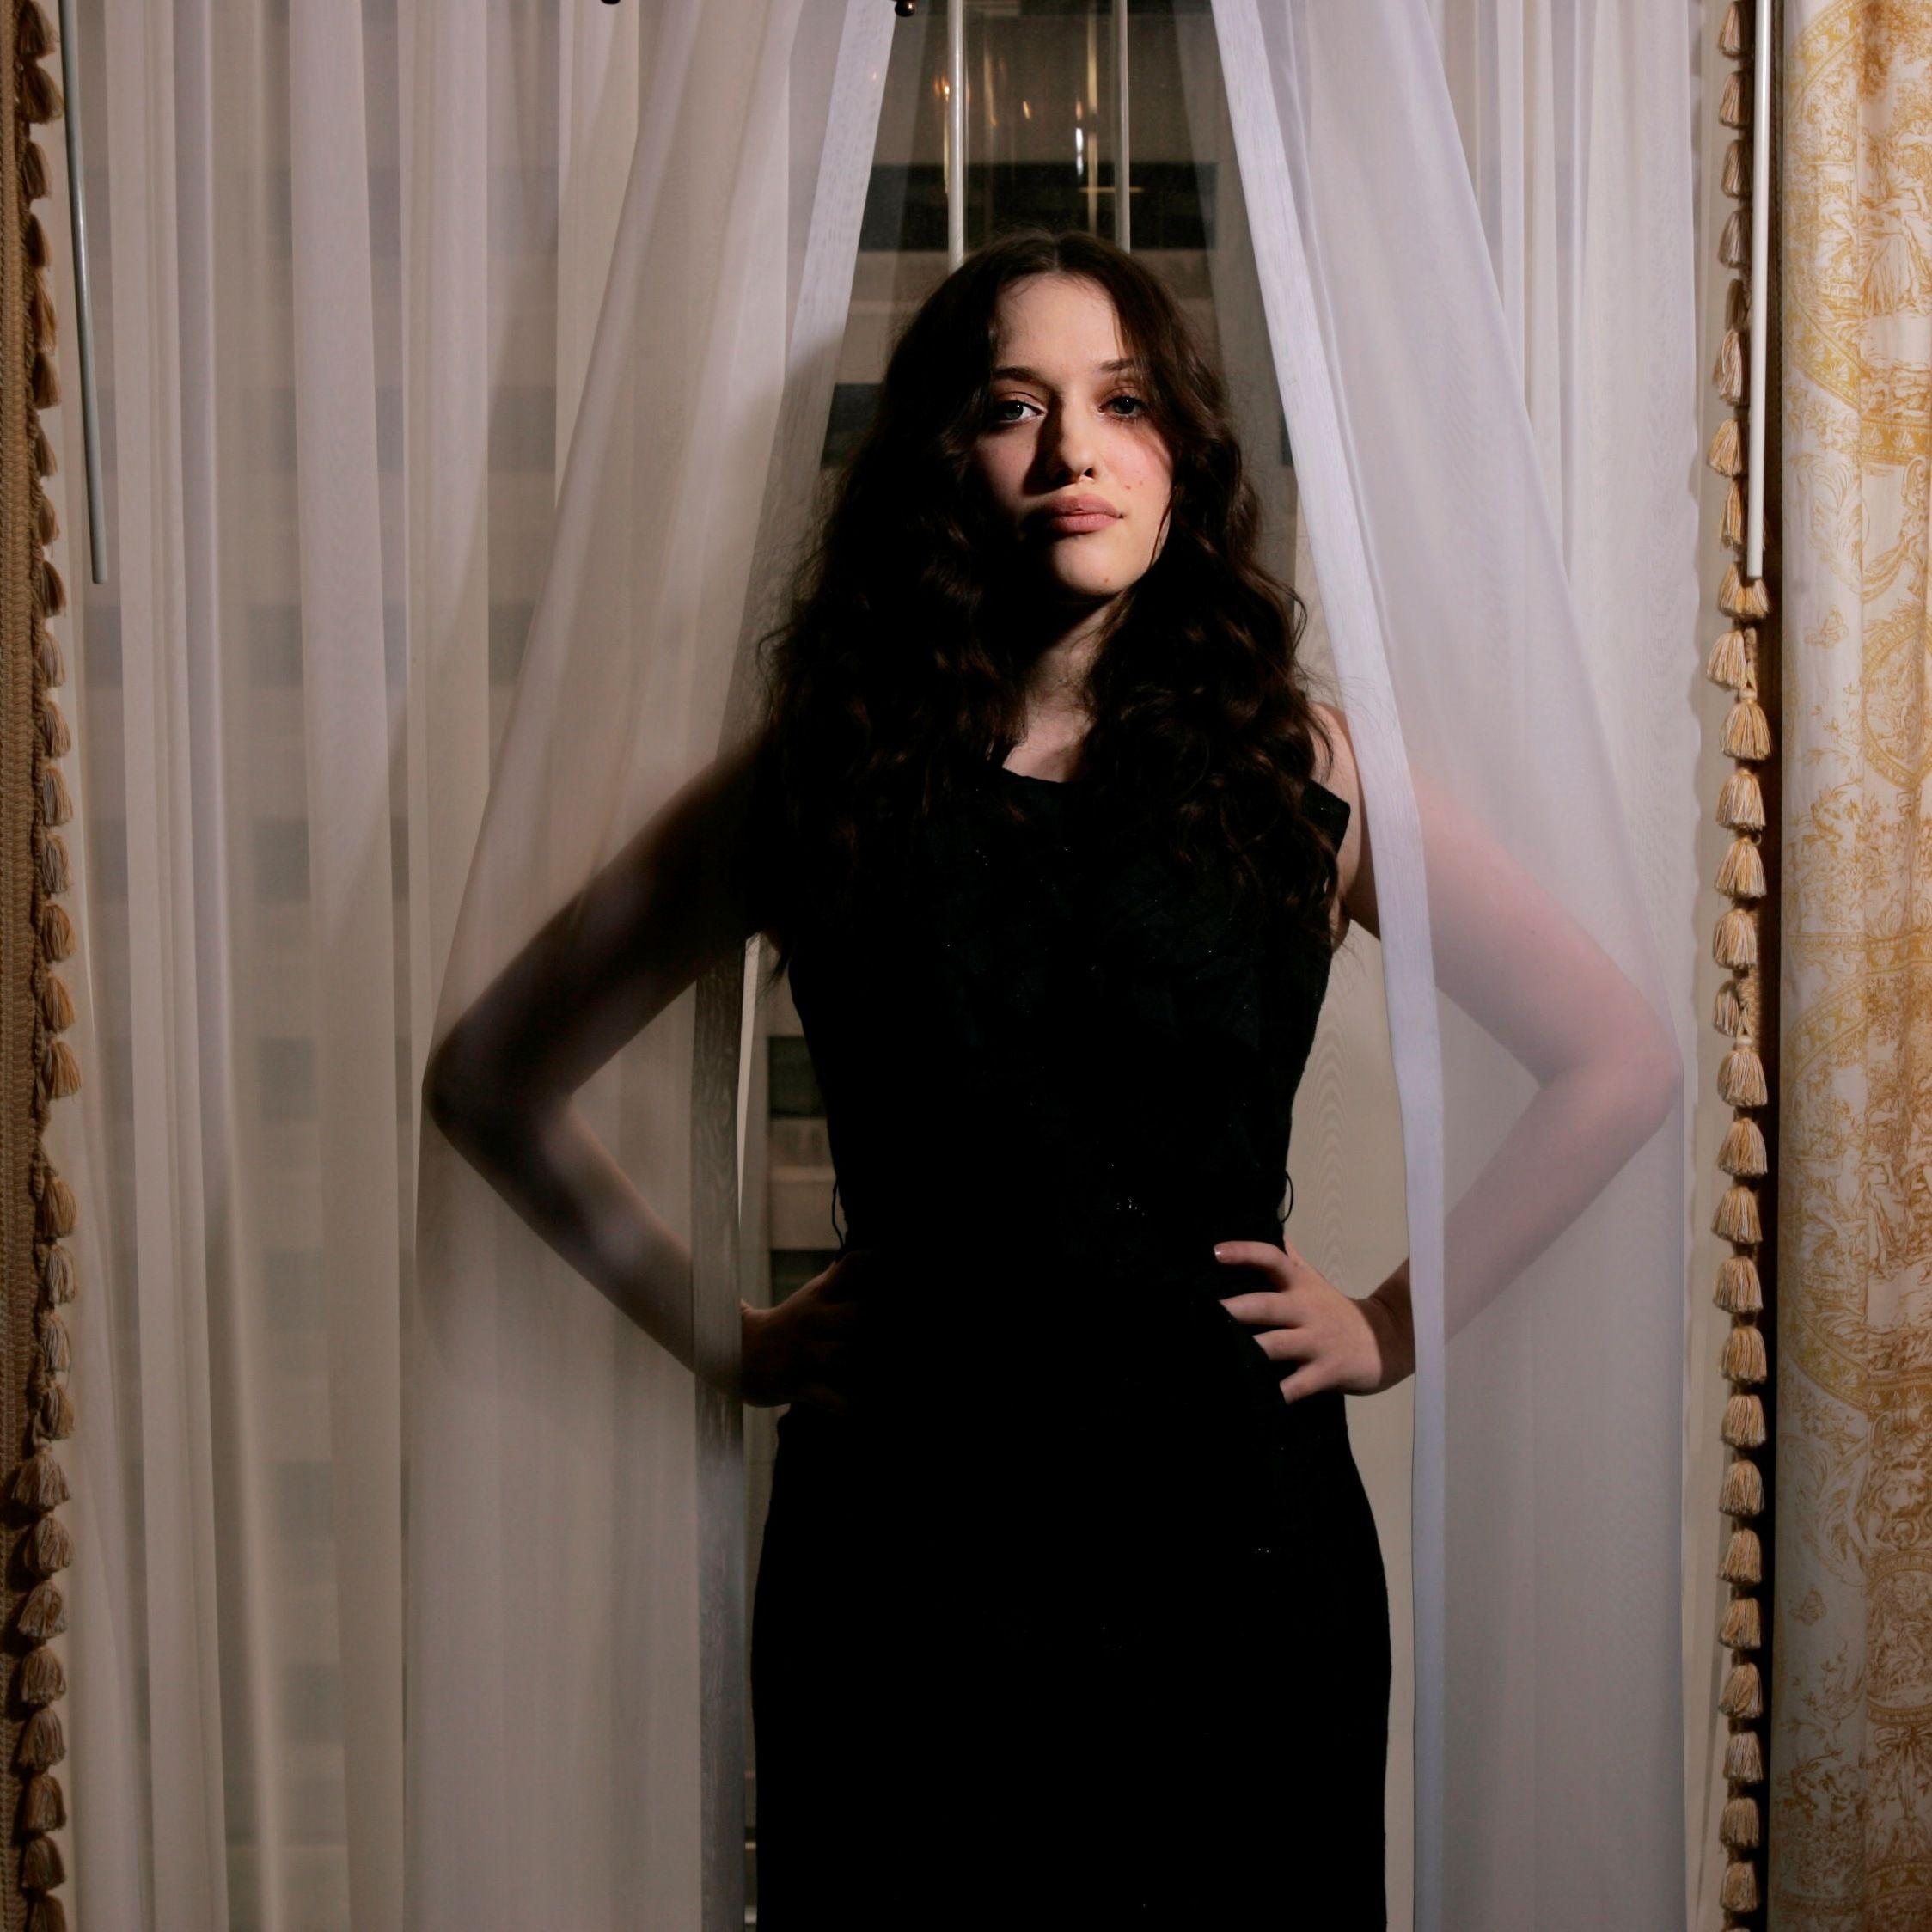 1280x720 Kat Dennings Black Dress Images 720p Wallpaper Hd Celebrities 4k Wallpapers Images Photos And Background Kat Dennings Black Dress Dress Images [ 2248 x 2248 Pixel ]